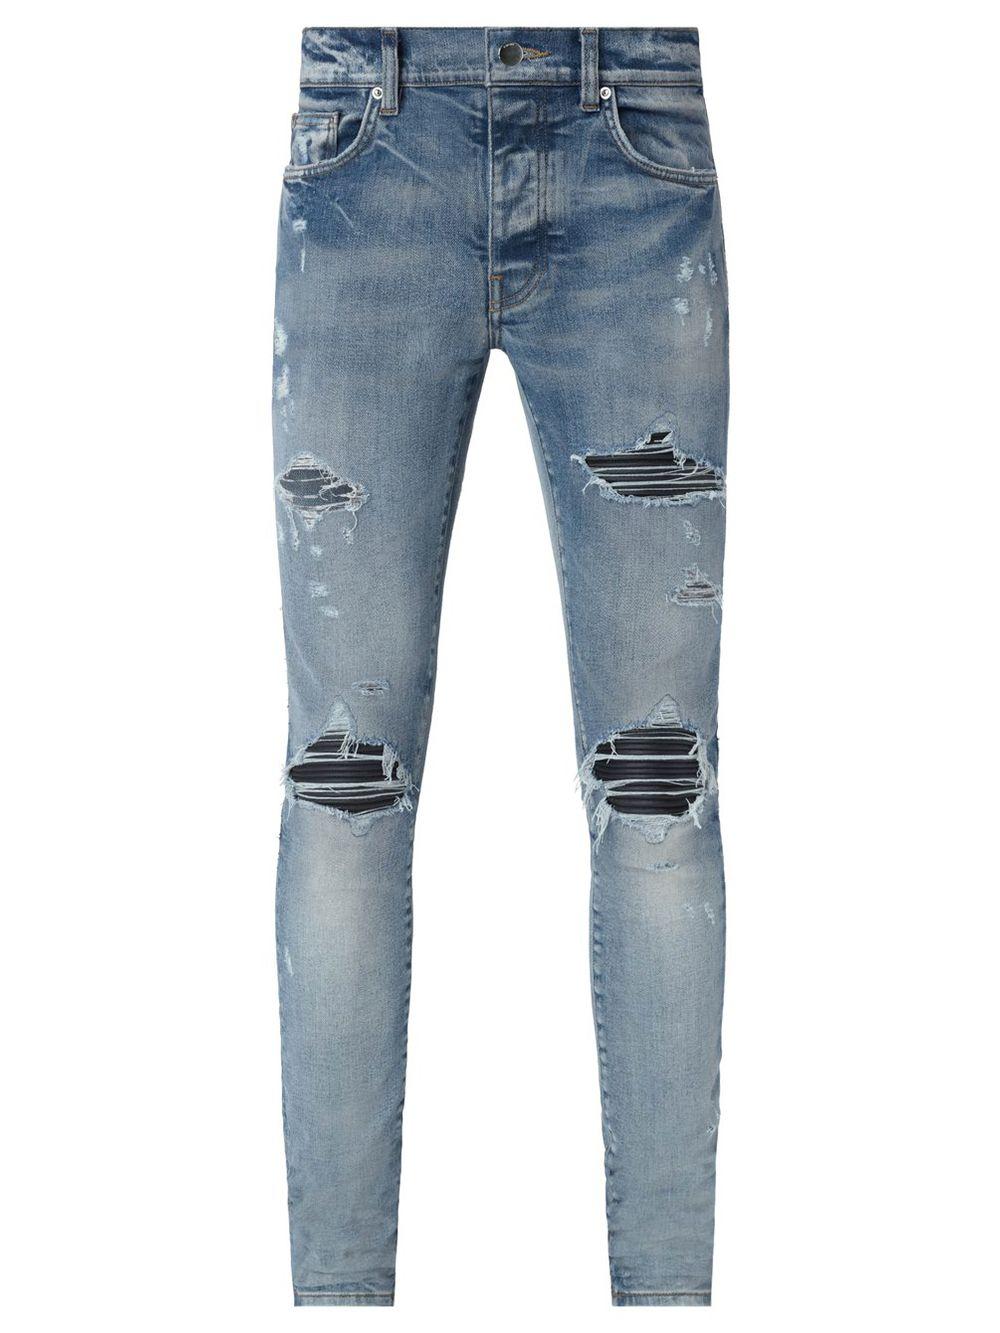 Distressed Leather Knee Mx1 Jeans Clay Indigo Blue